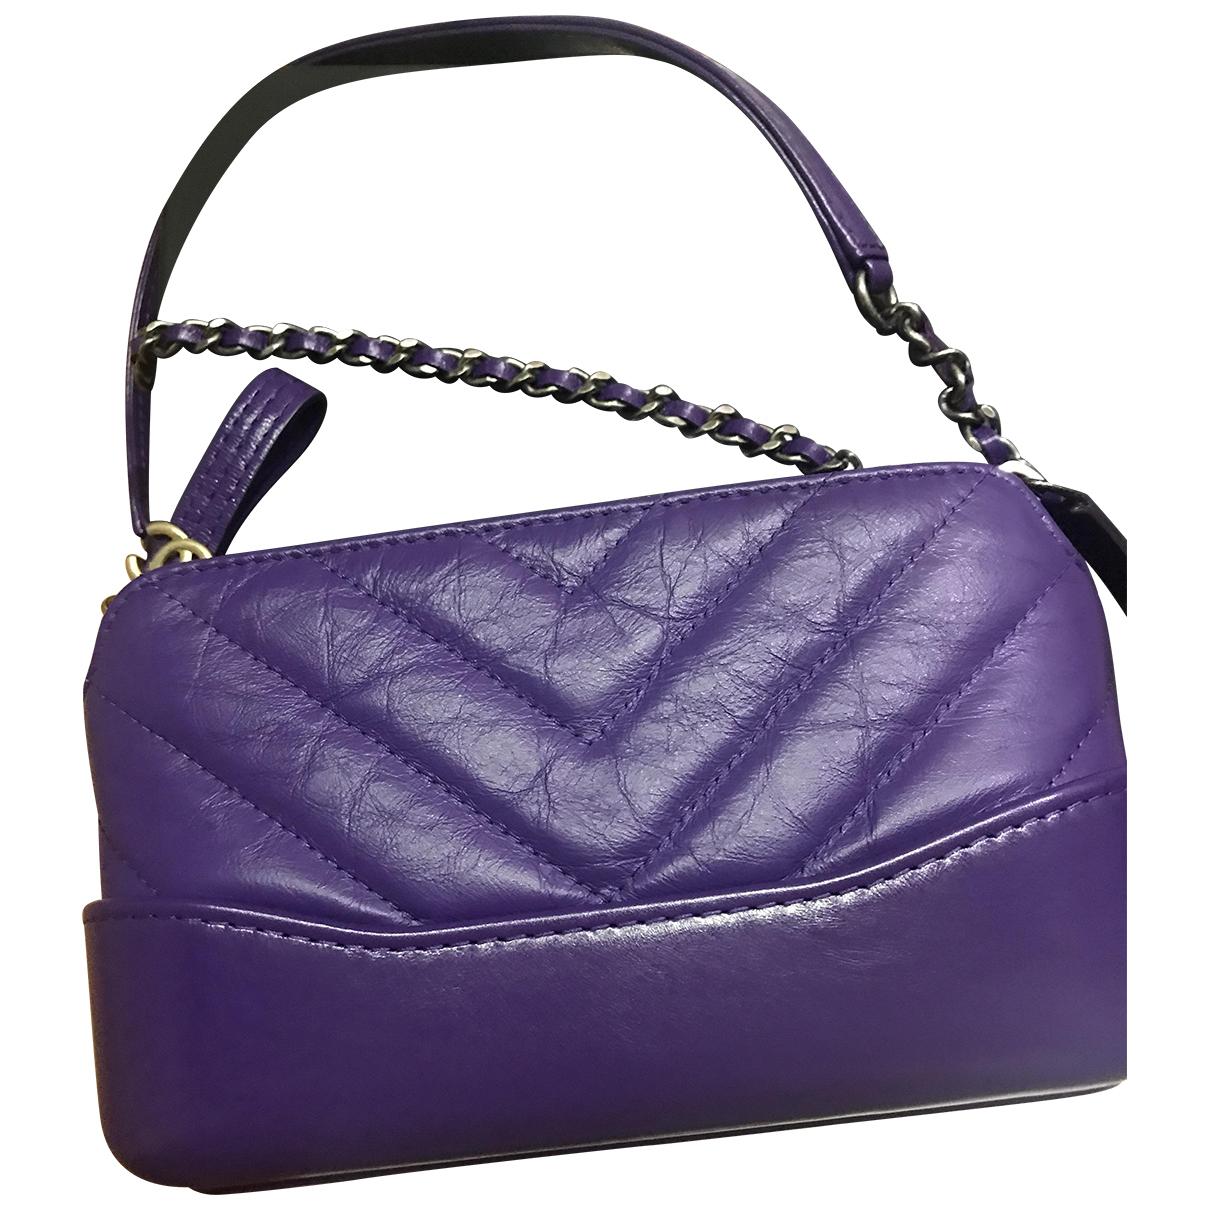 Chanel Gabrielle Purple Leather handbag for Women \N